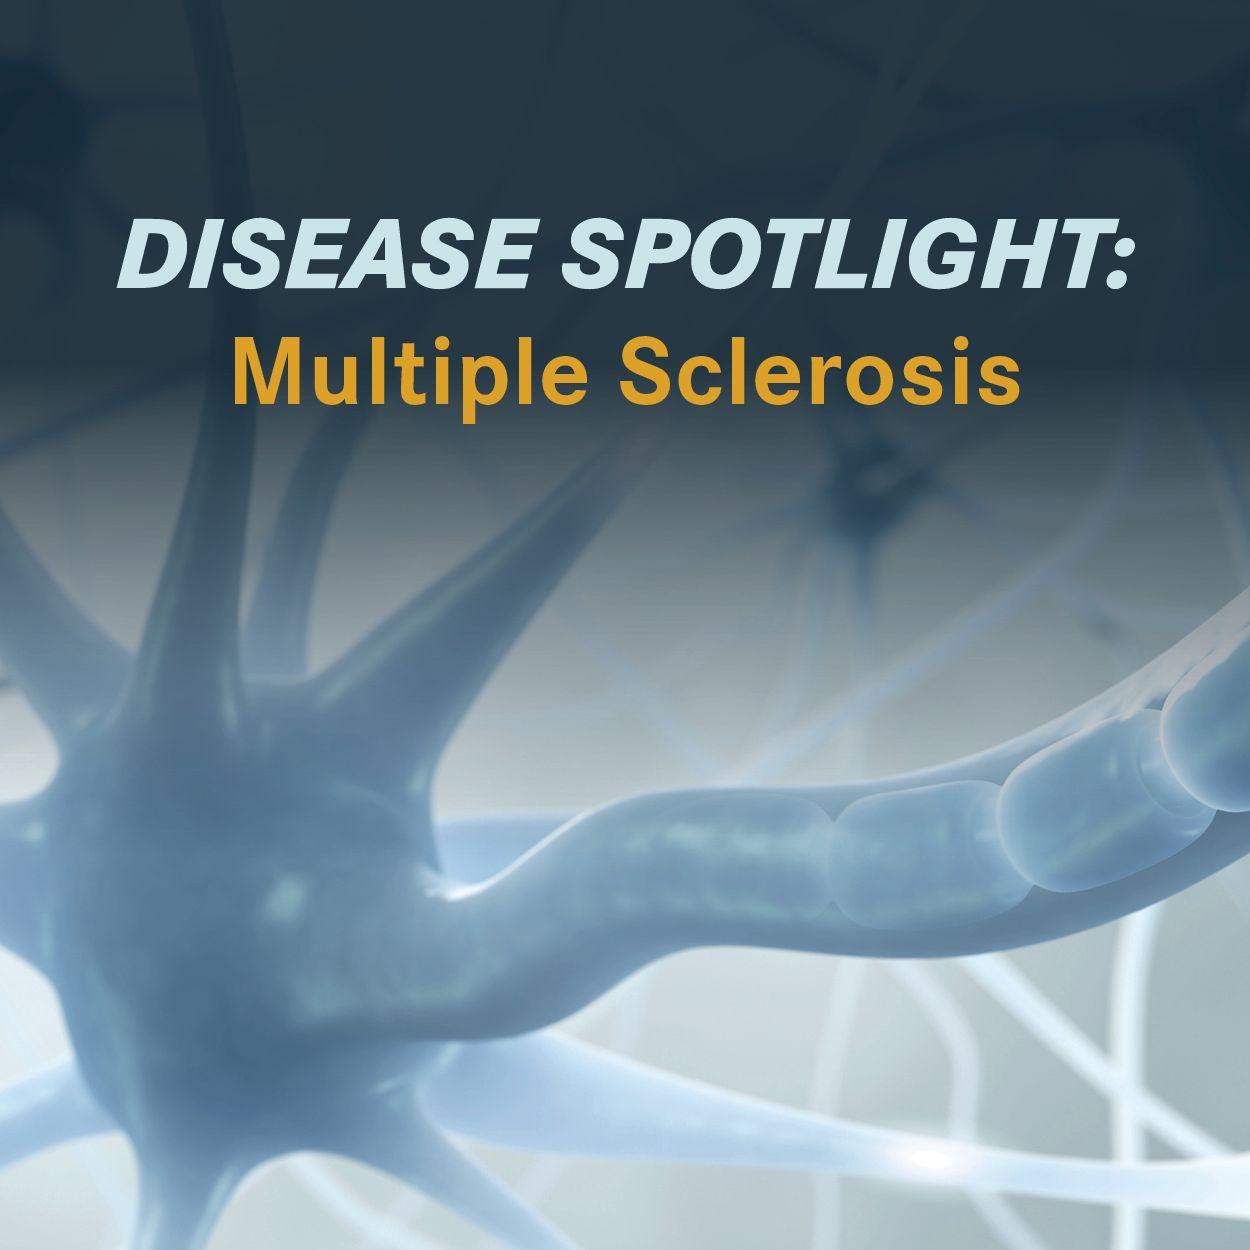 Disease Spotlight | <b>Disease Spotlight: Multiple Sclerosis</b>